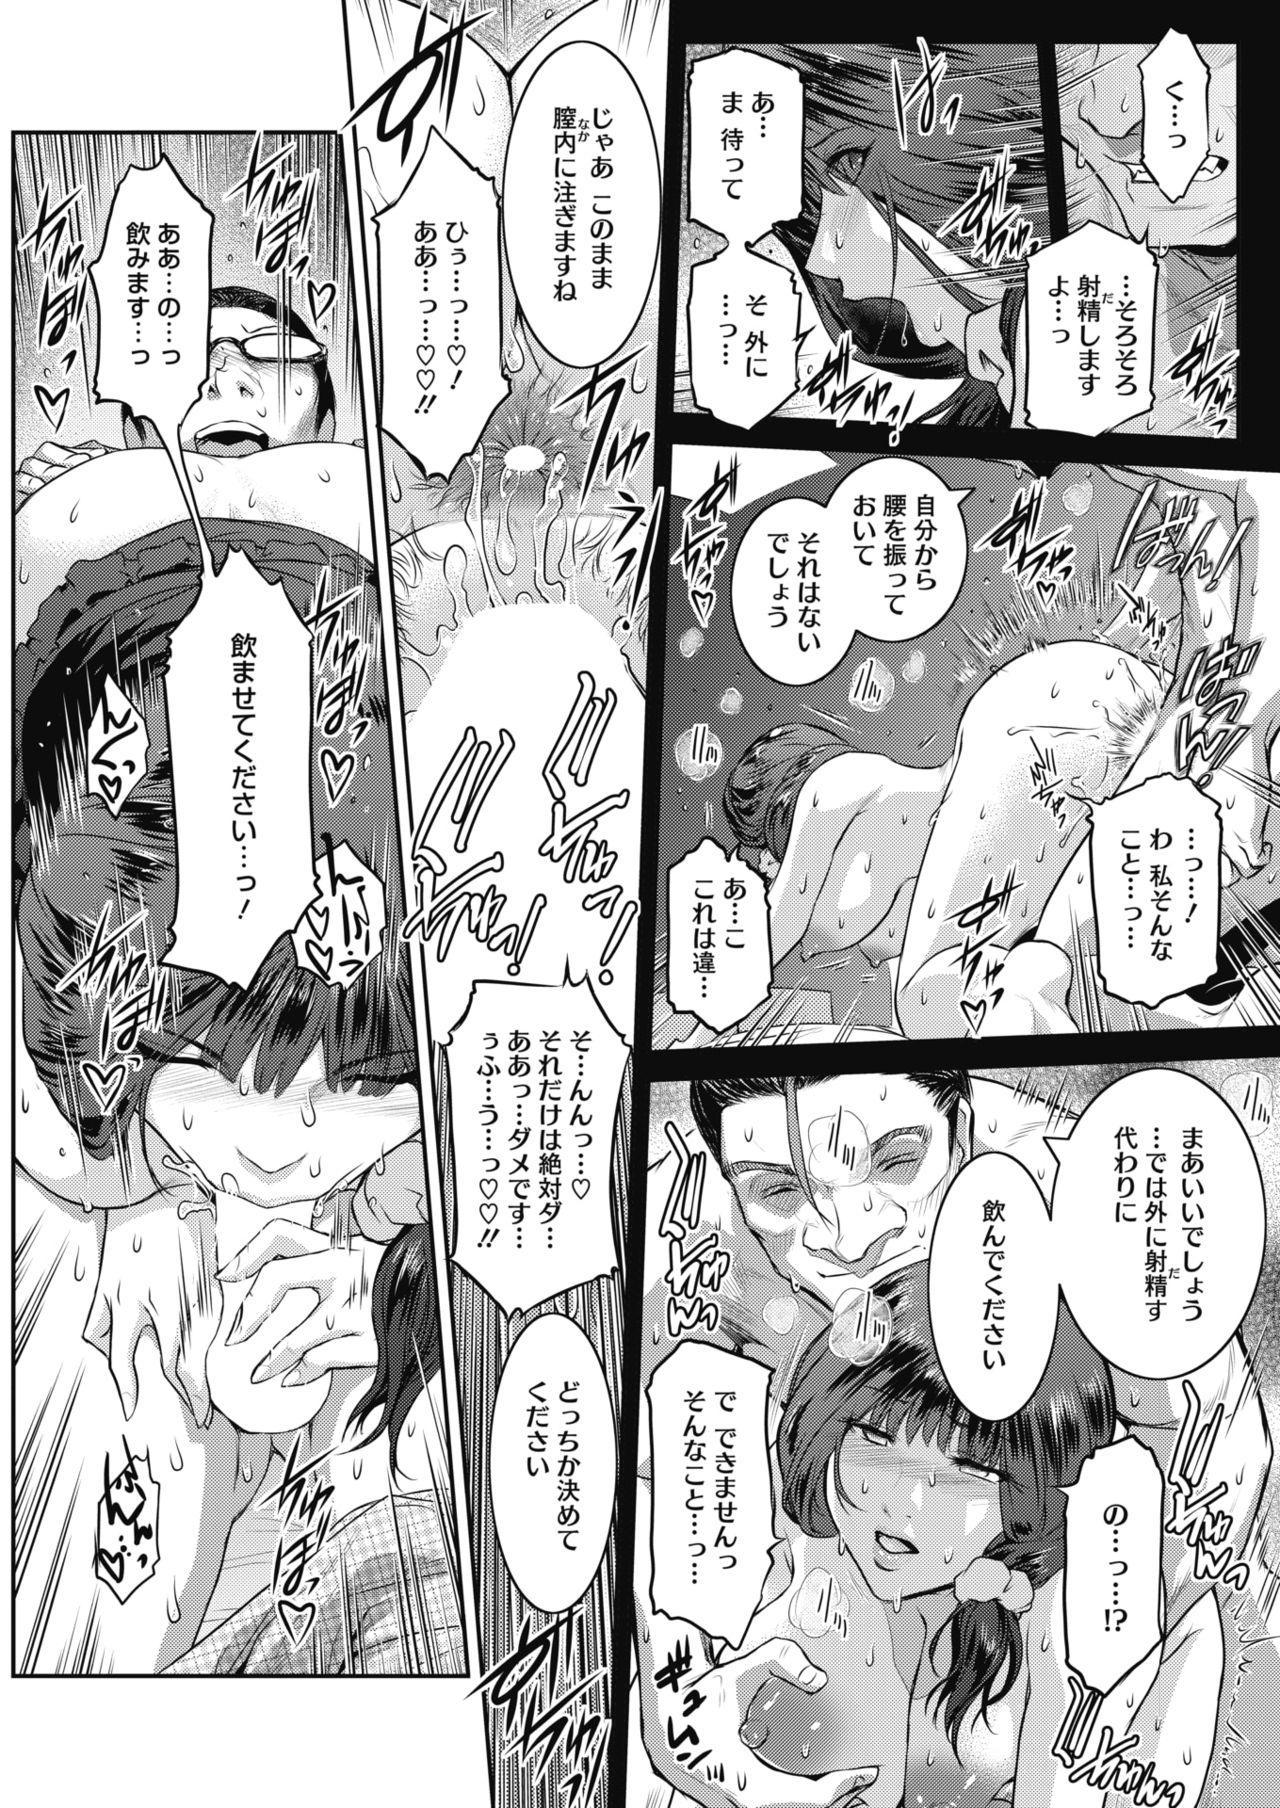 COMIC HOTMiLK Koime Vol. 17 22